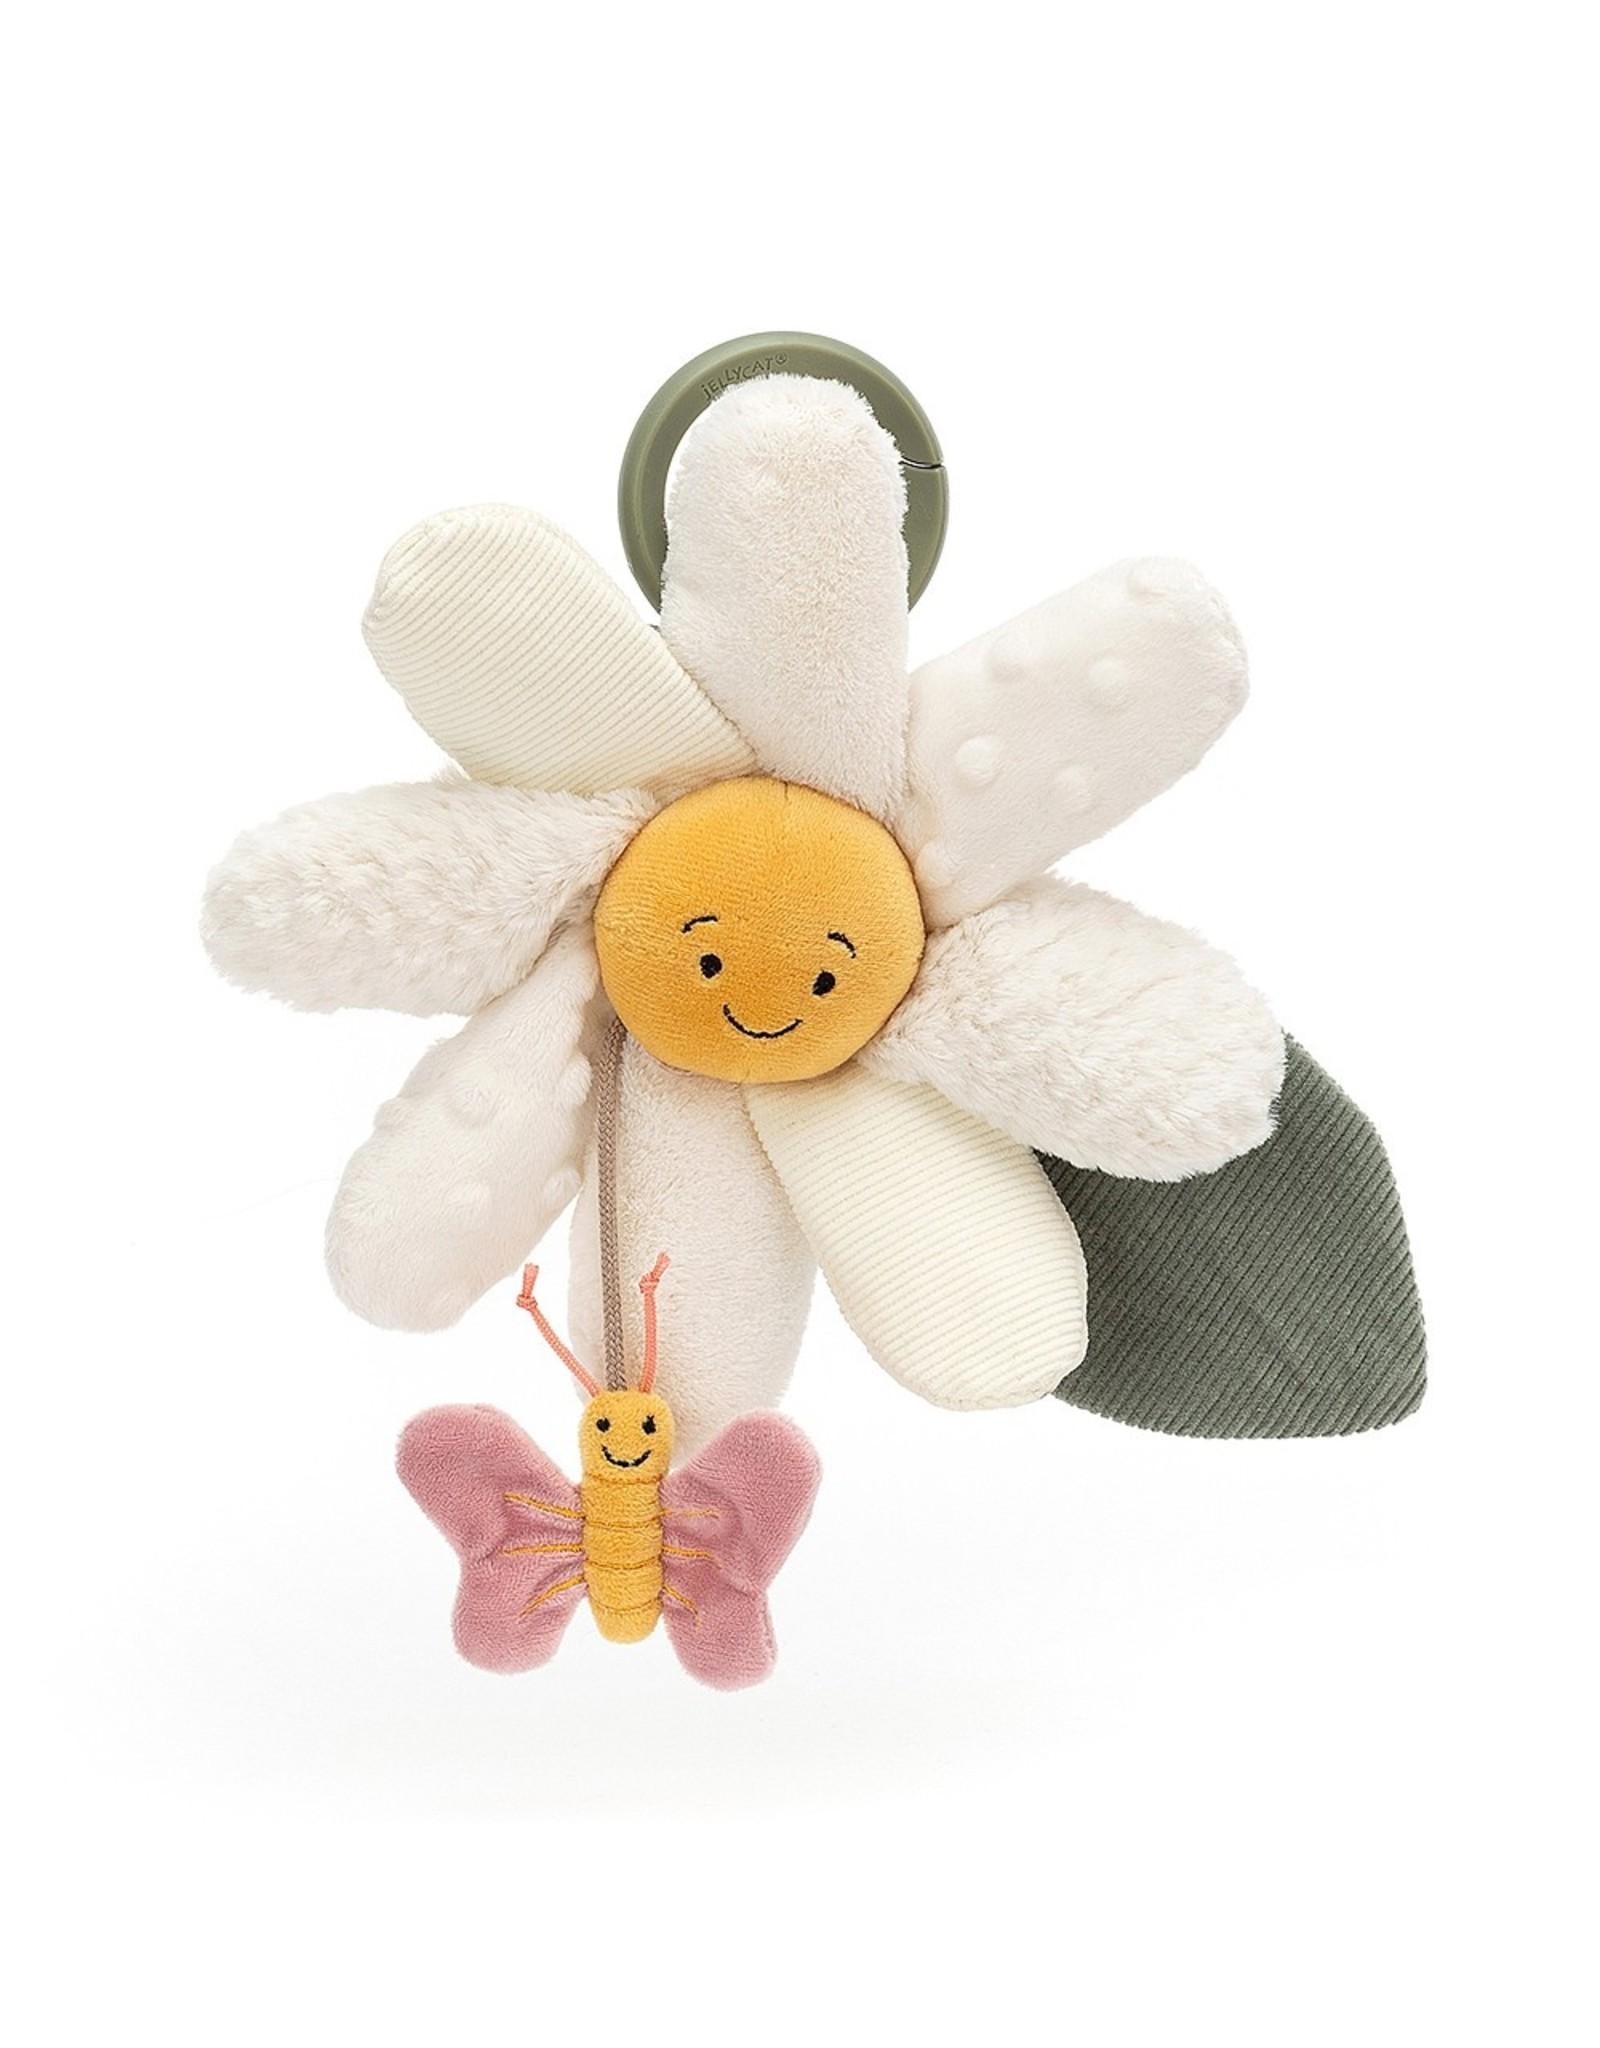 Jellycat Fleury daisy activity toys